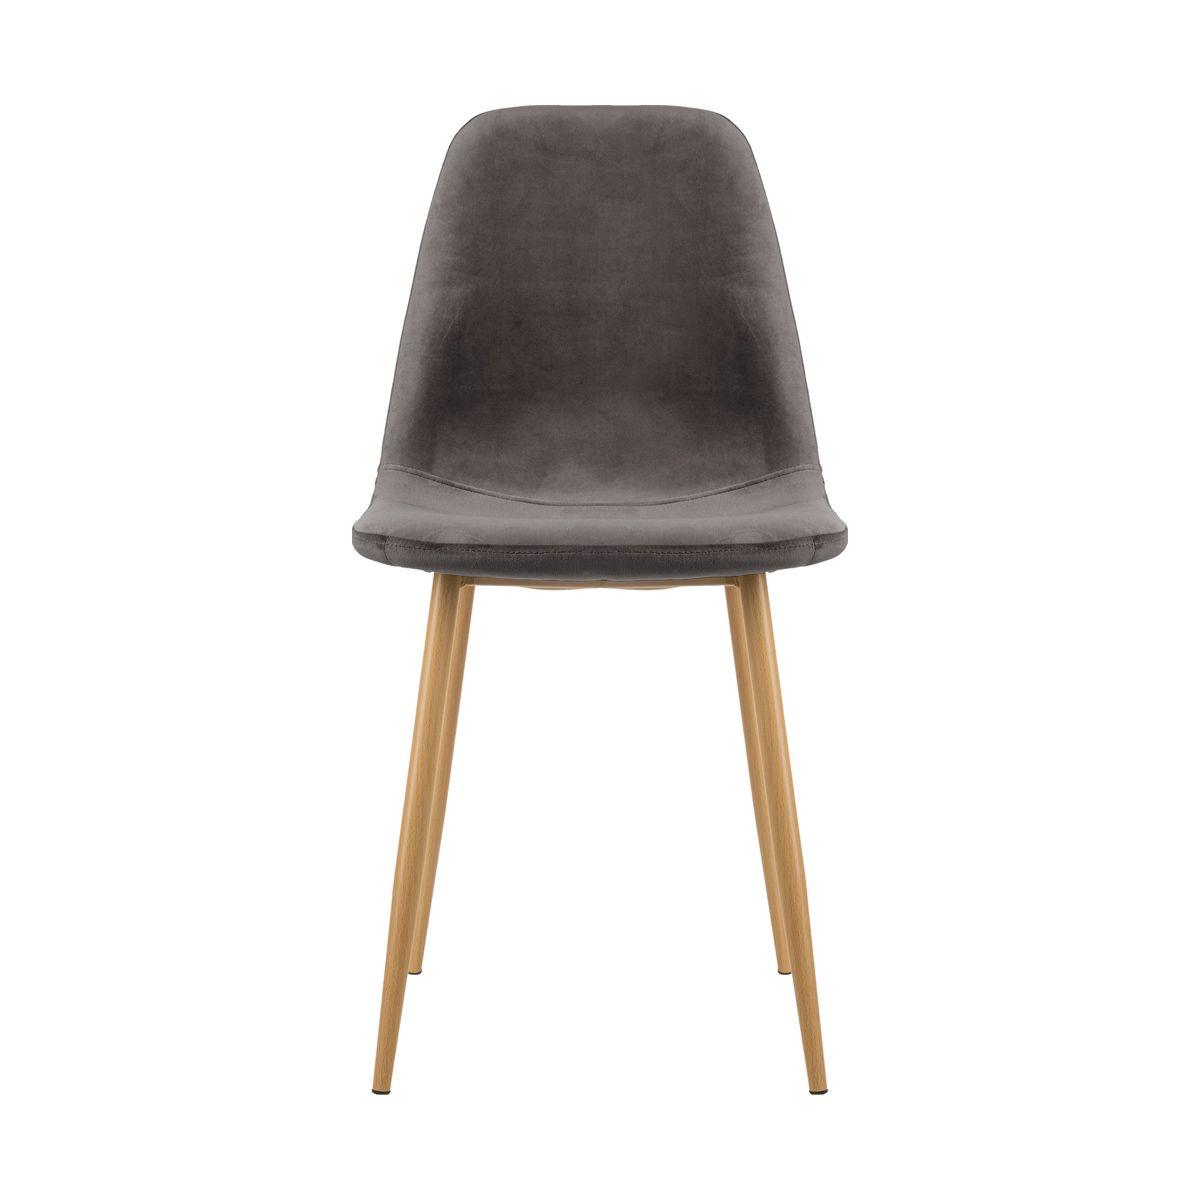 Chaise grise scandinave en velours Roka